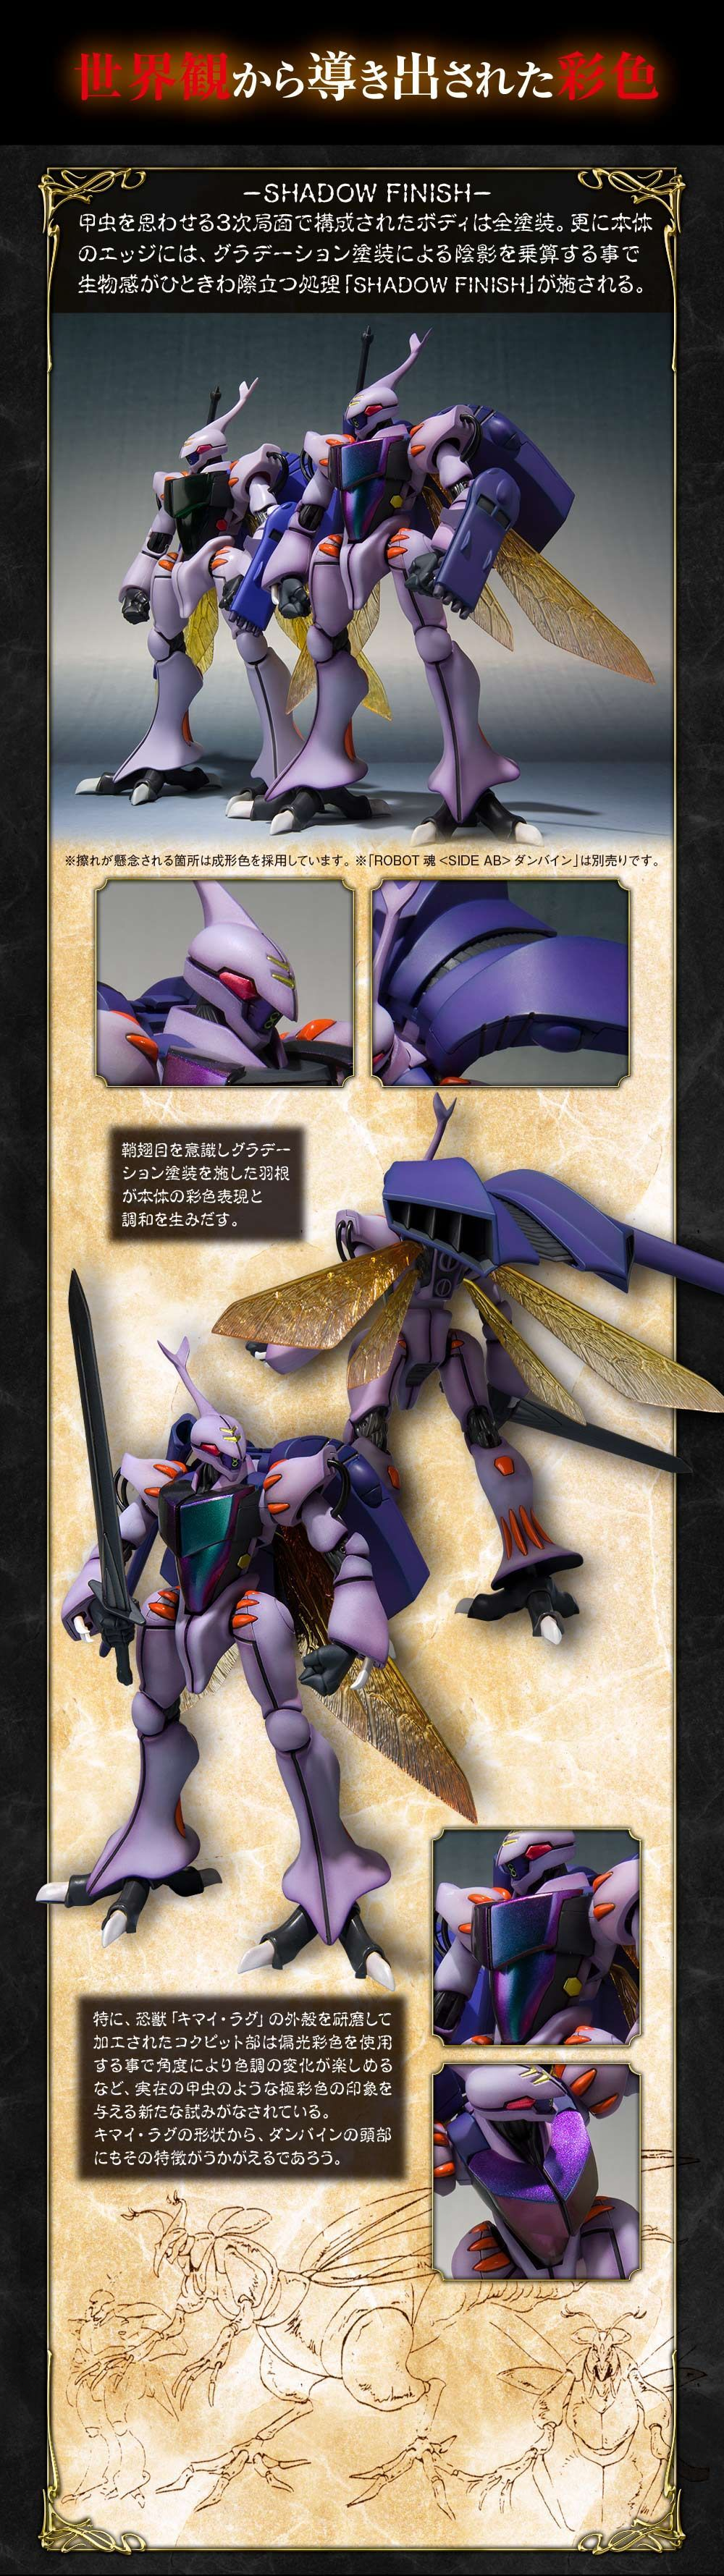 ROBOT魂 ダンバイン SHADOW FINISH02